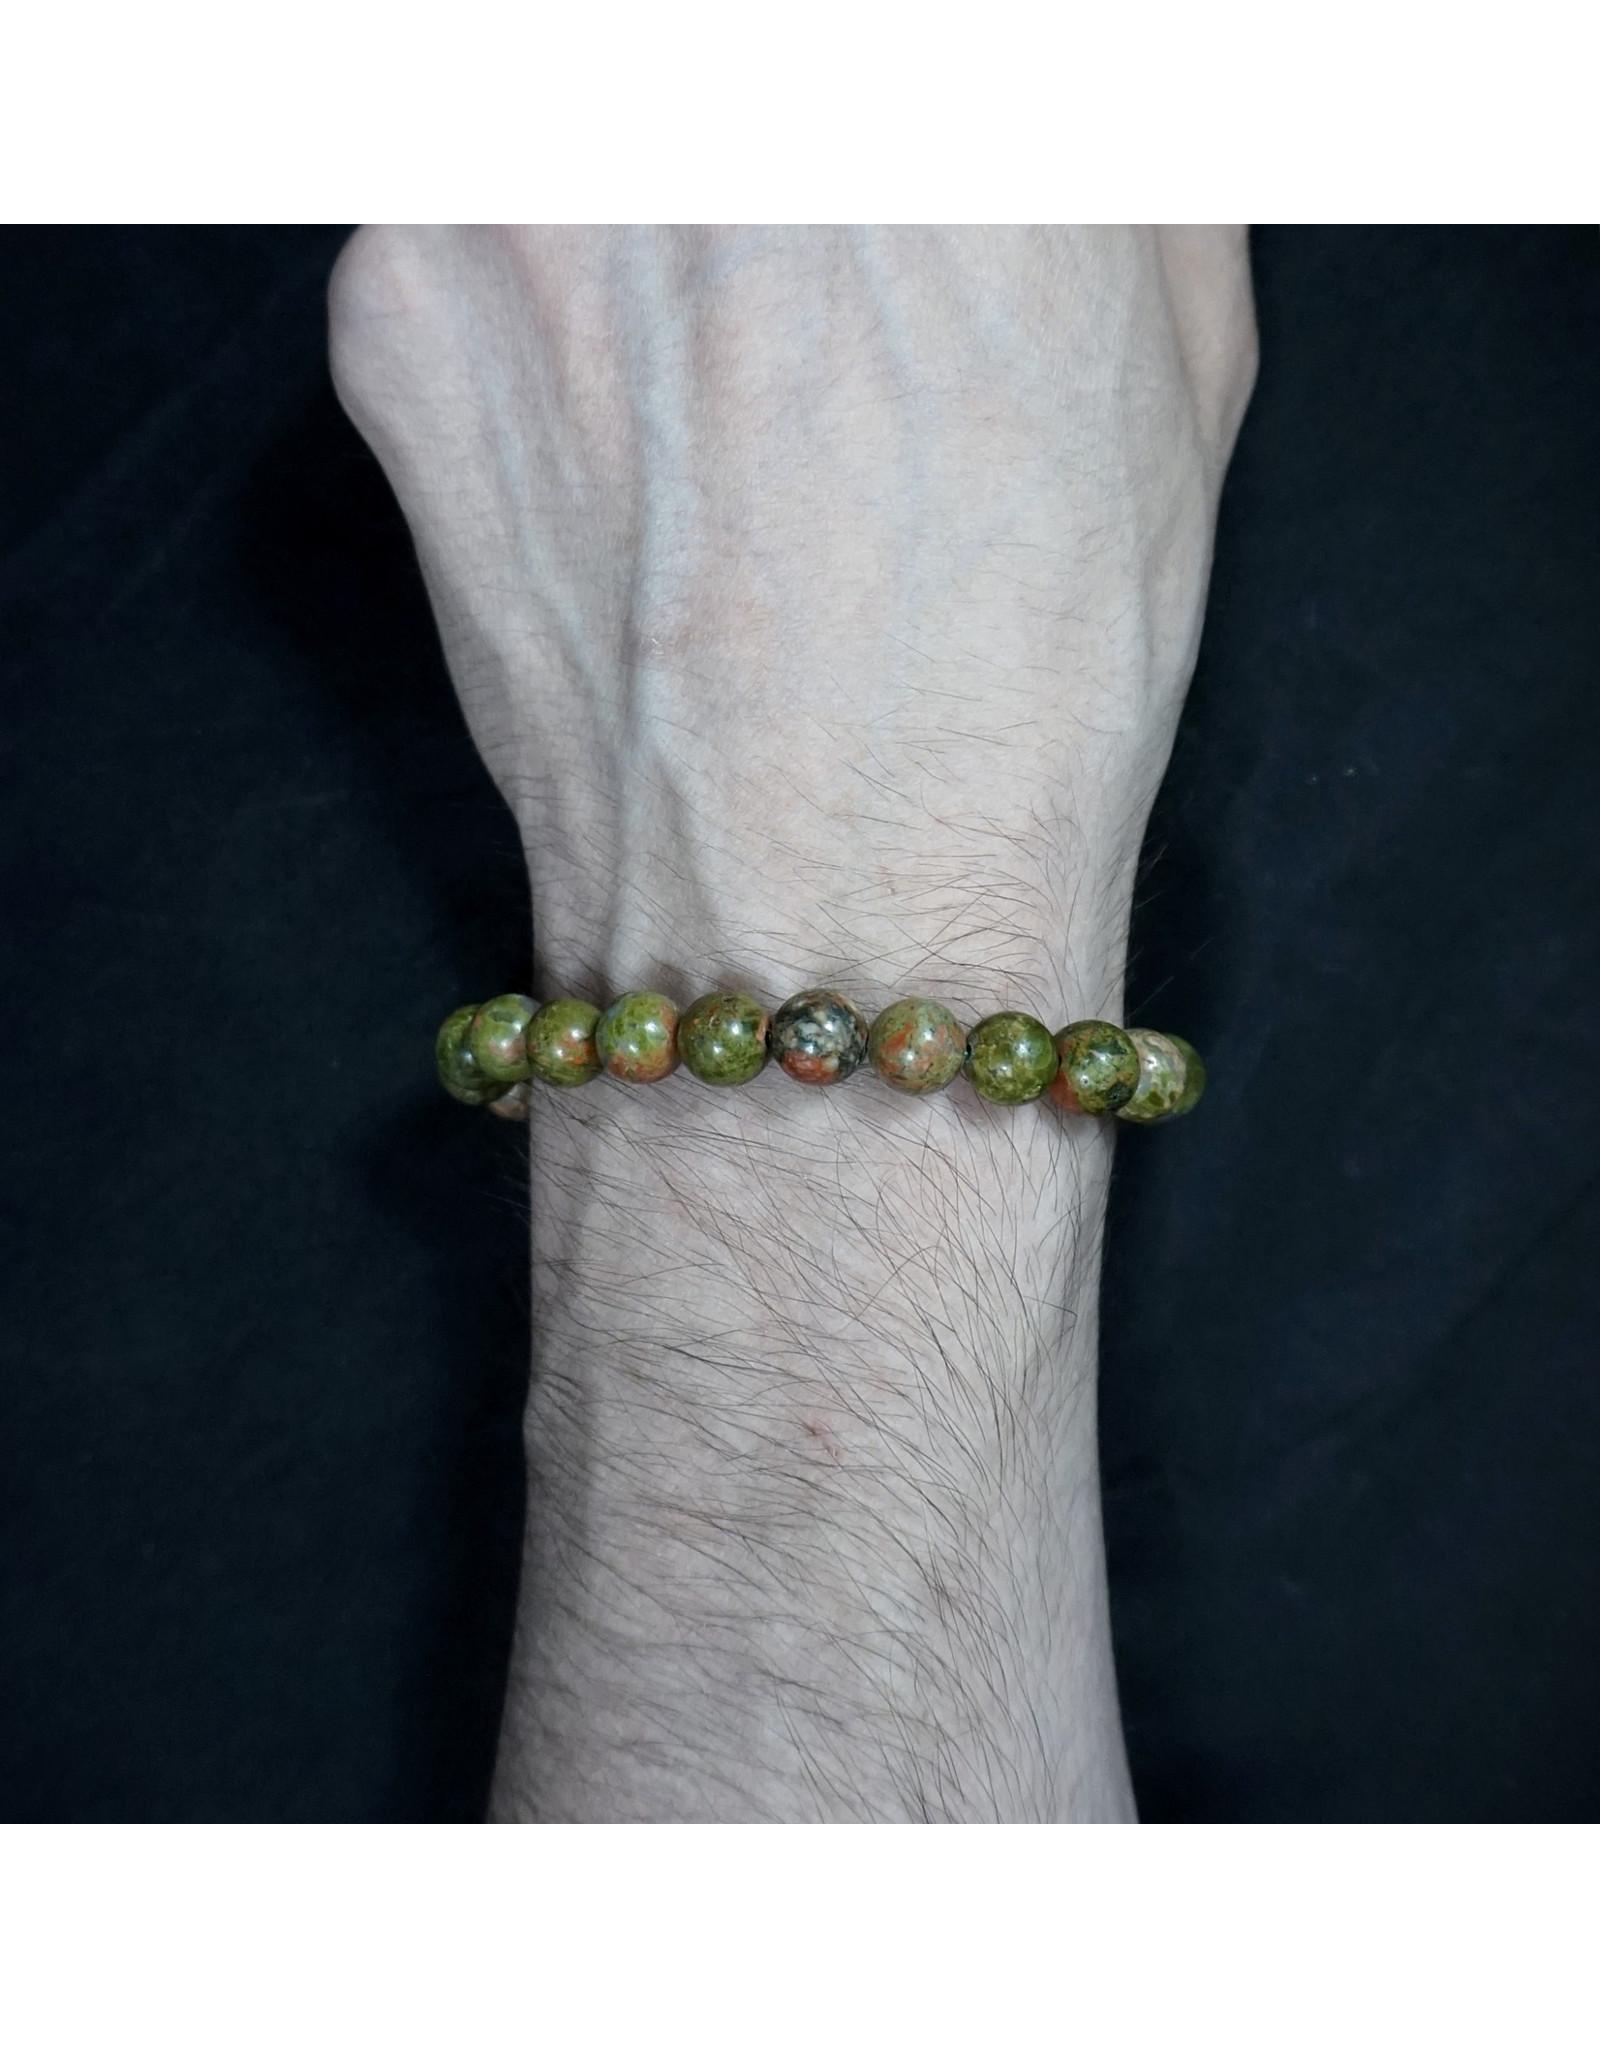 Elastic Bracelet 8mm Round Beads - Unakite